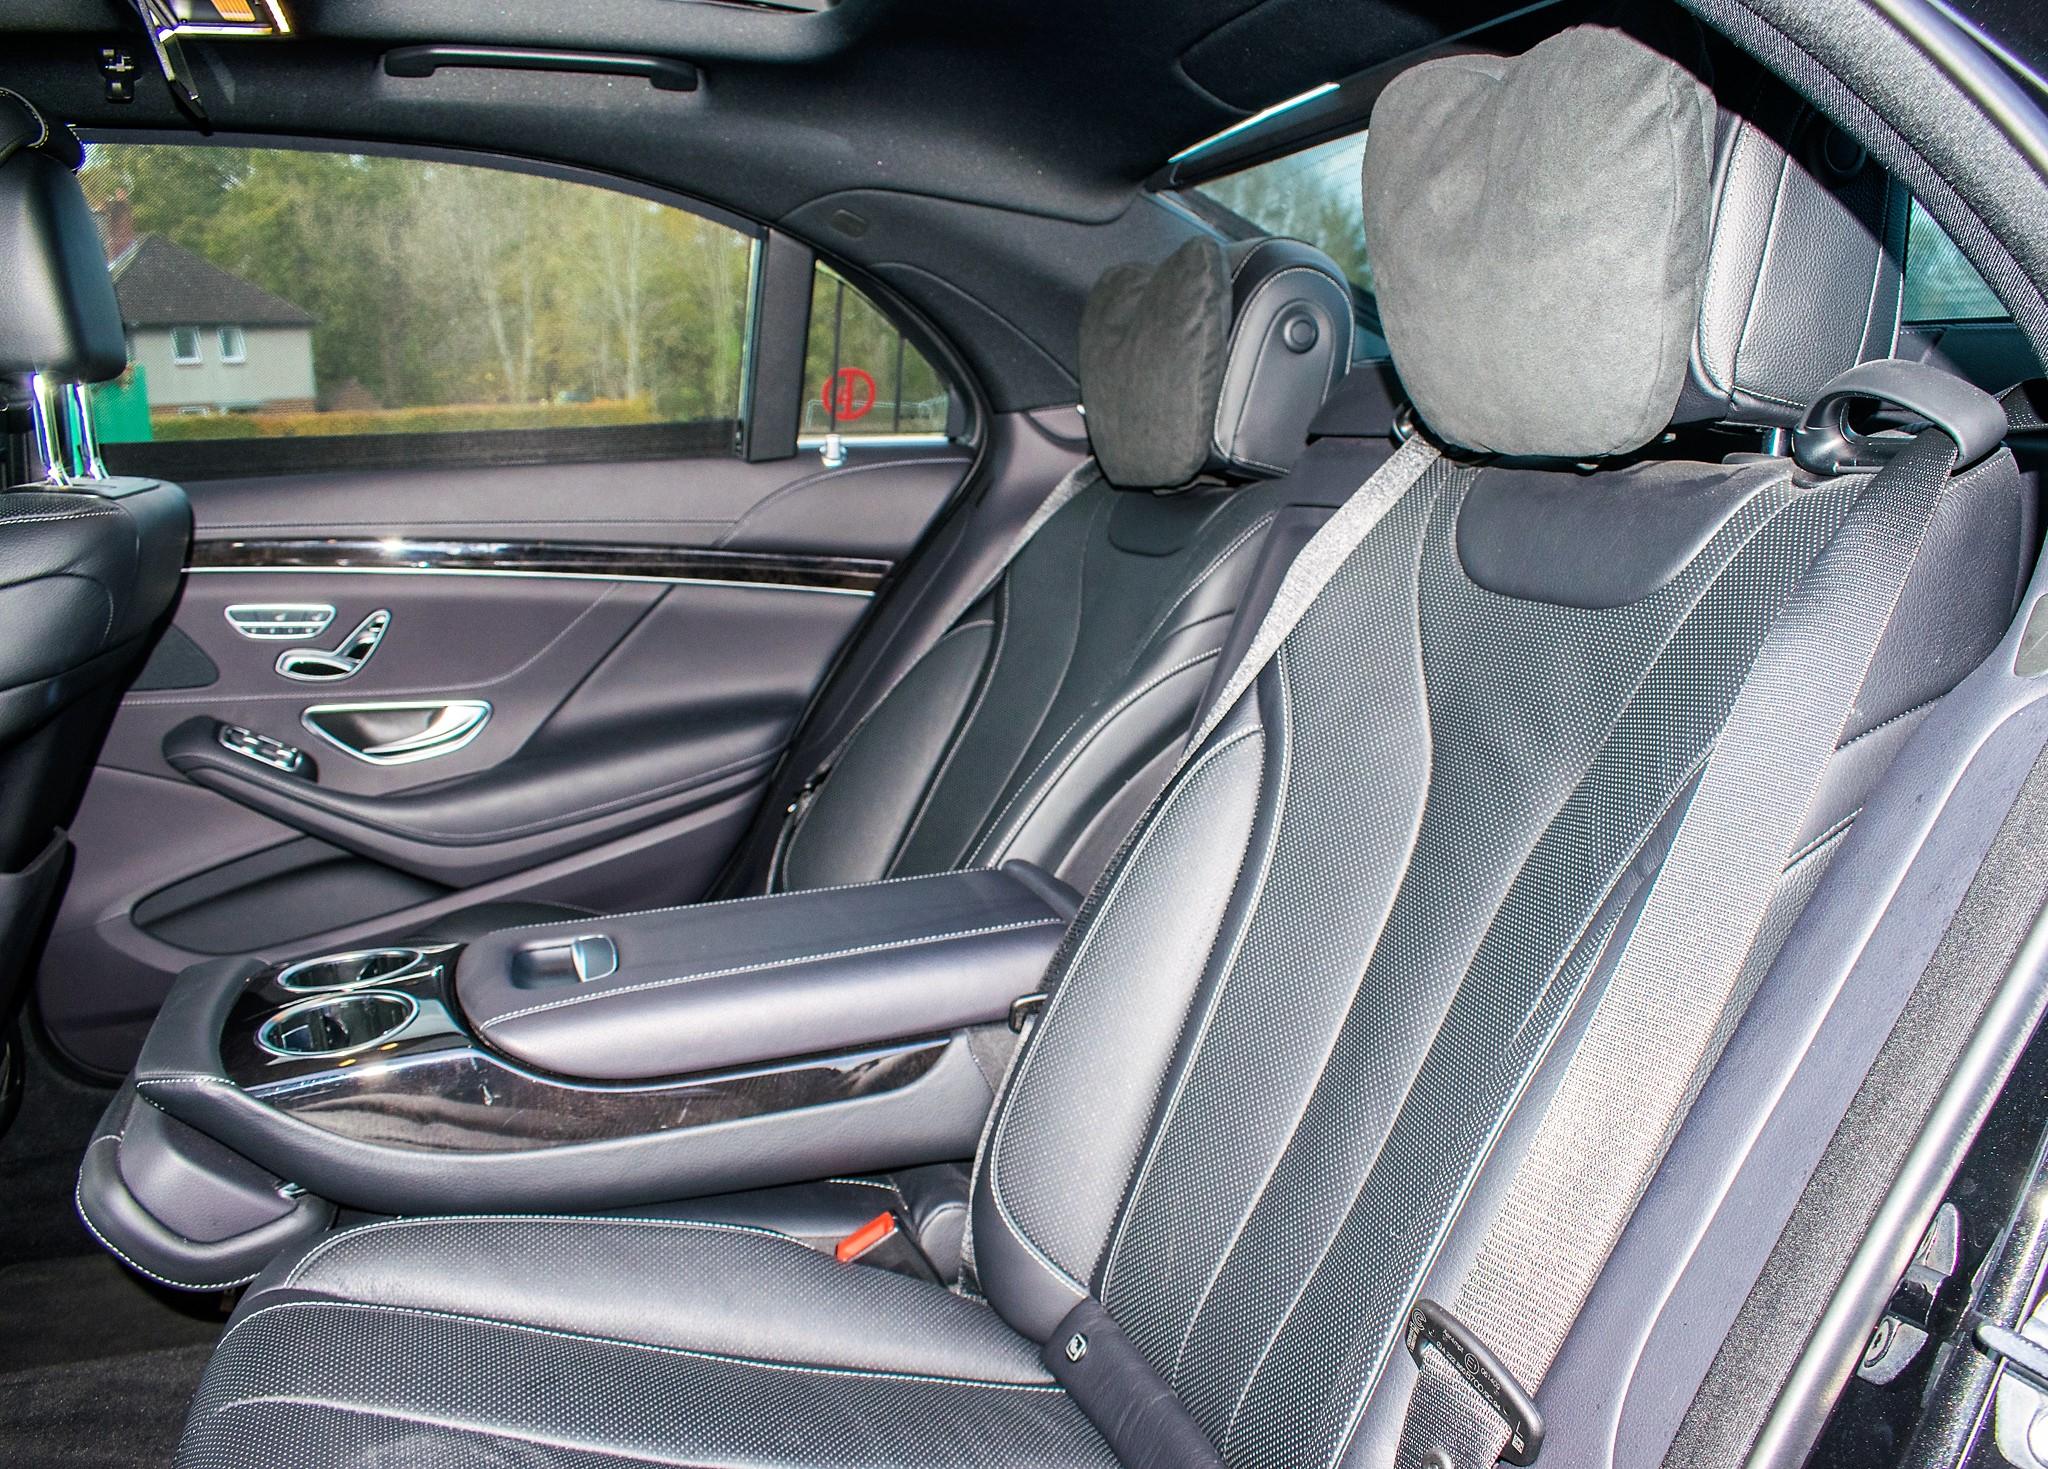 Mercedes Benz S450 L AMG Line Executive auto petrol 4 door saloon car Registration Number: FX68 - Image 23 of 33